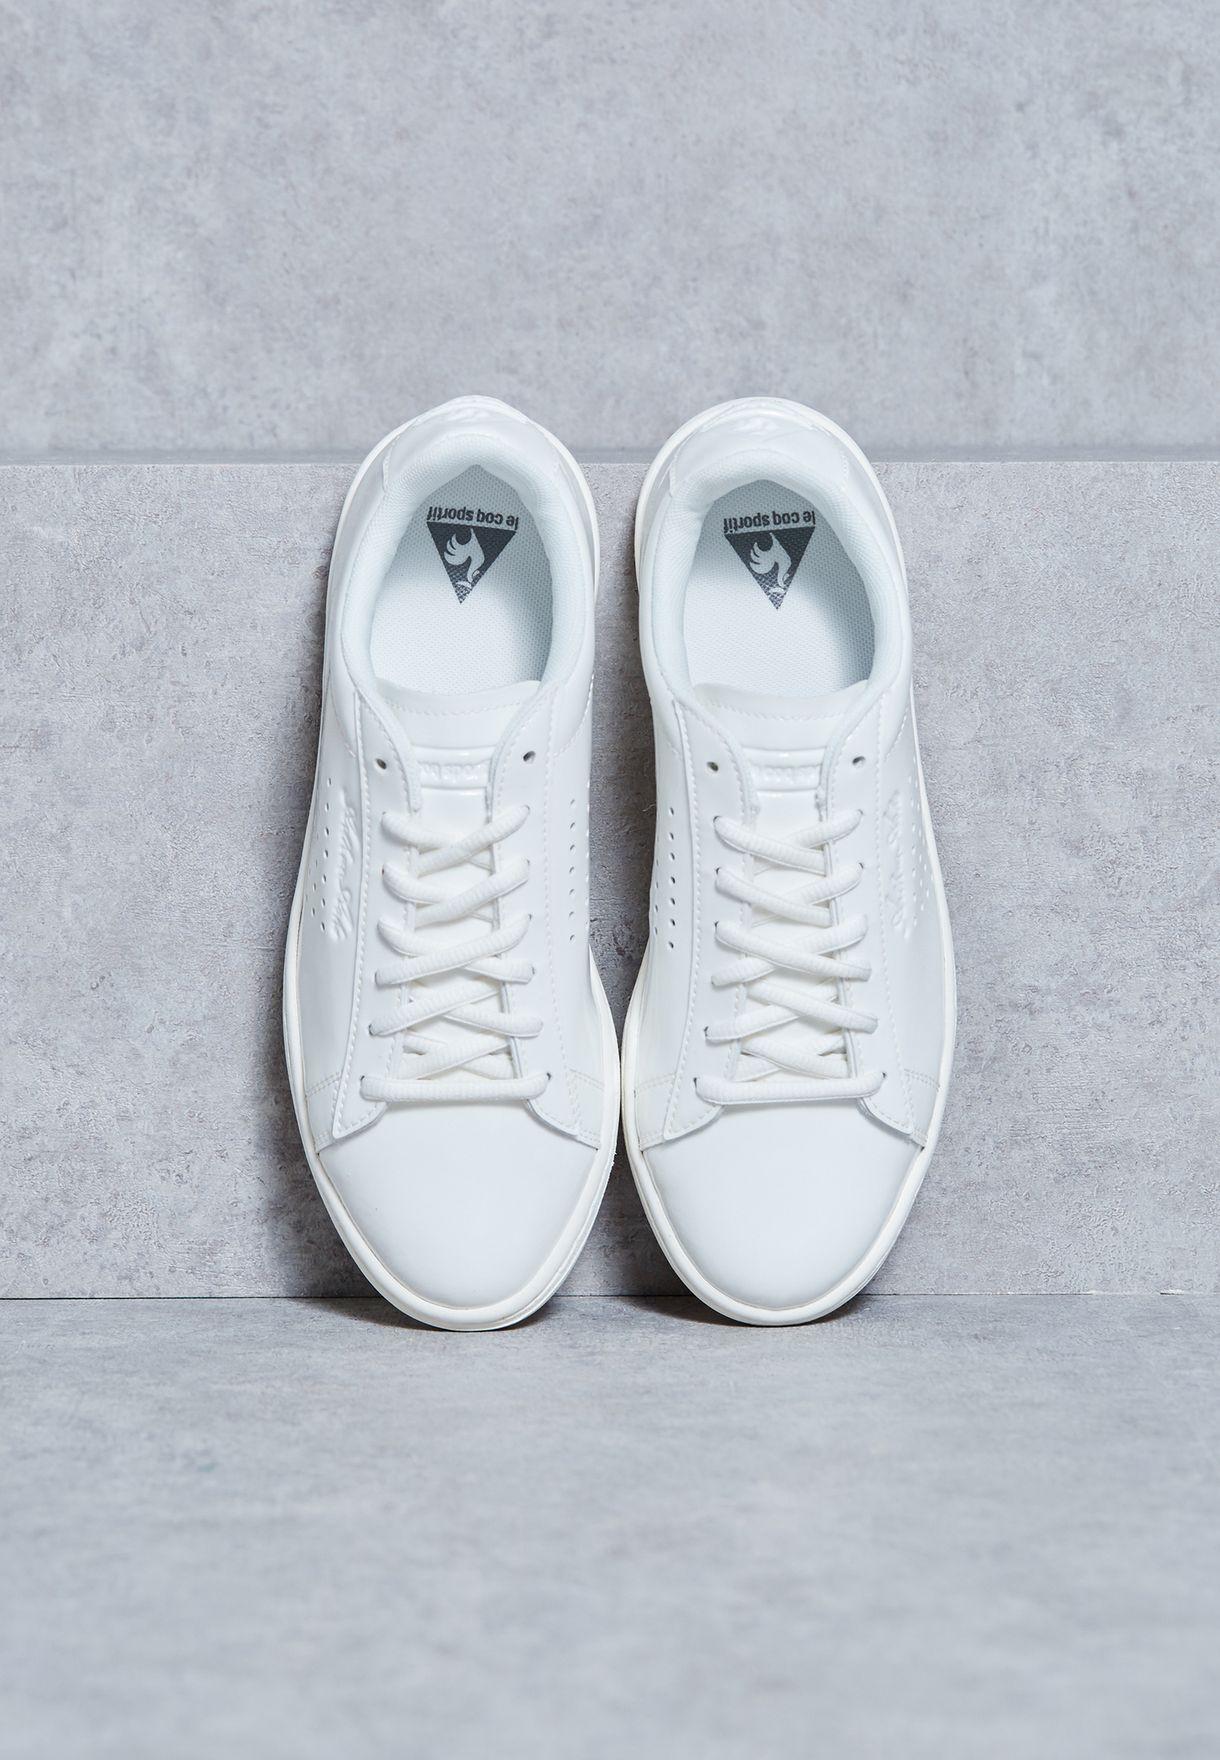 03ffa752a753 Shop Le Coq Sportif white Arthur Ashe Patent Sneakers 1620241 for ...